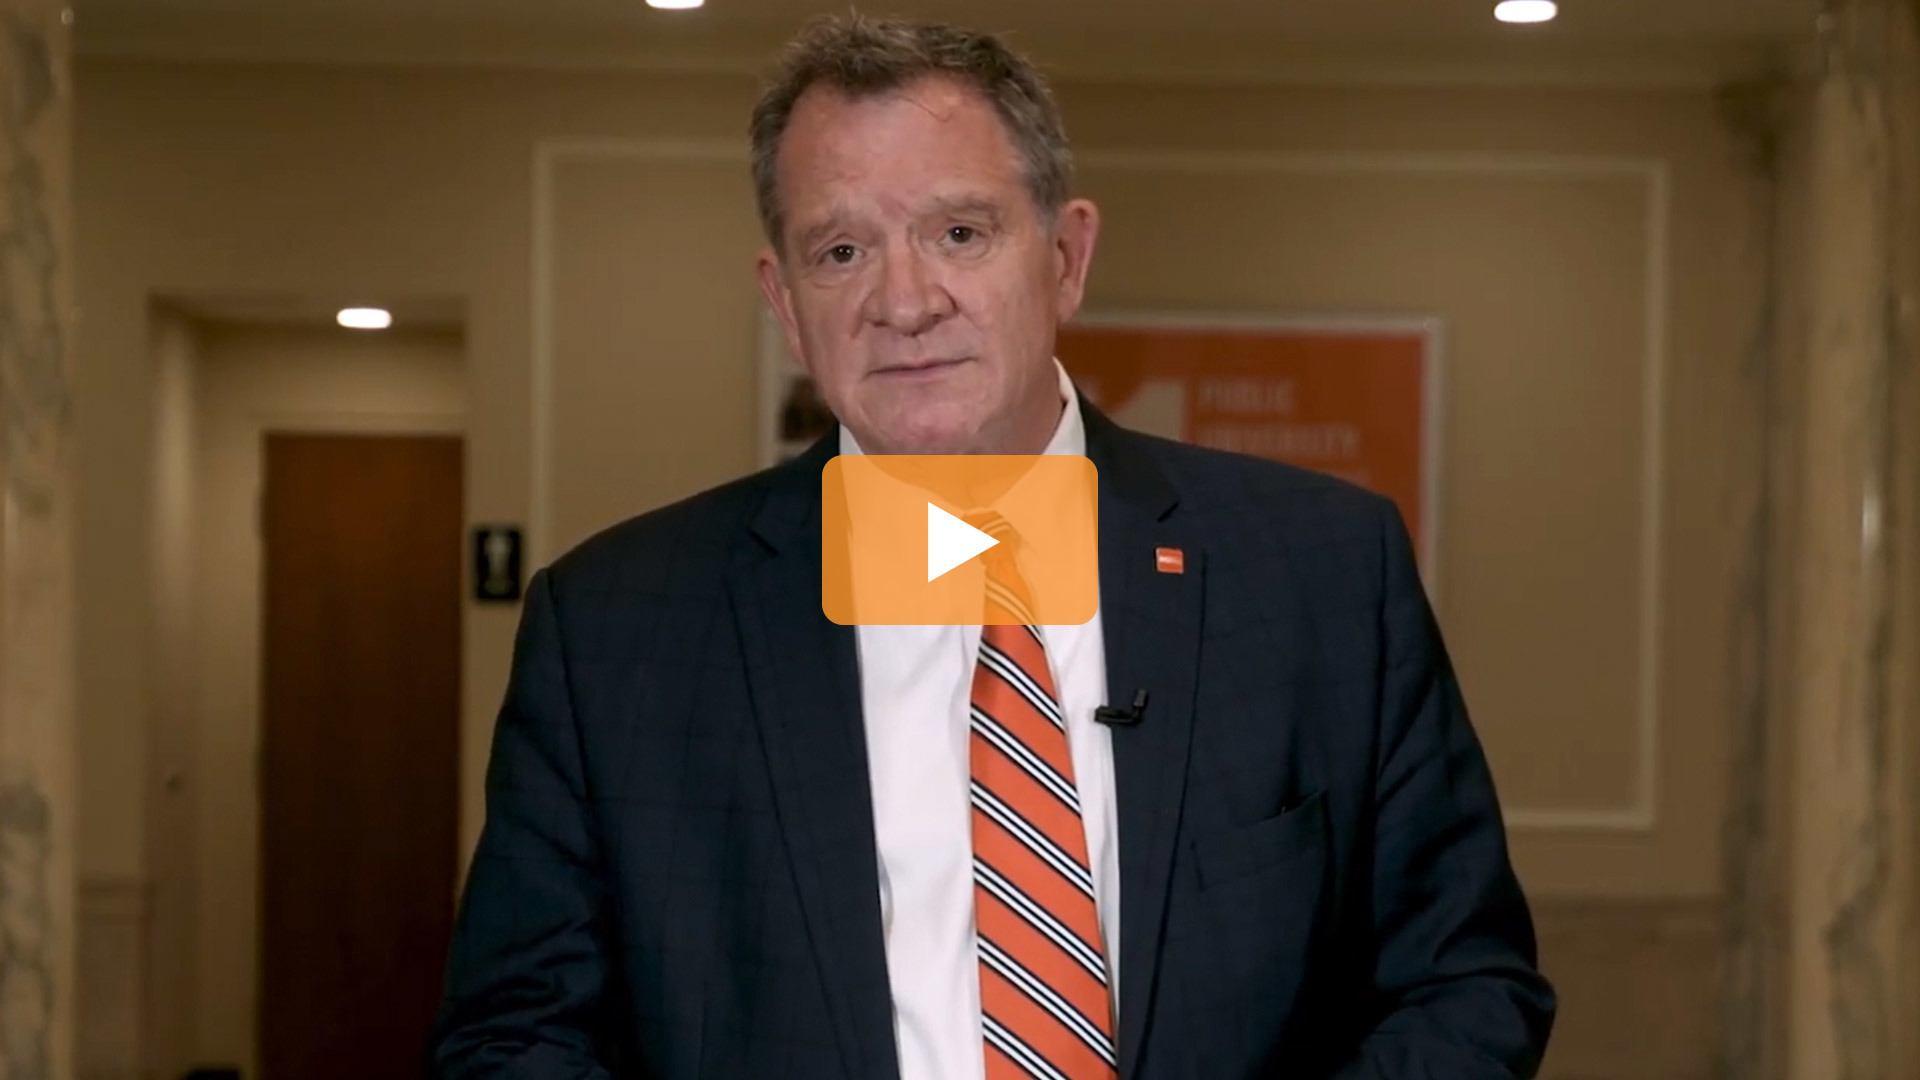 BGSU President Rogers video update